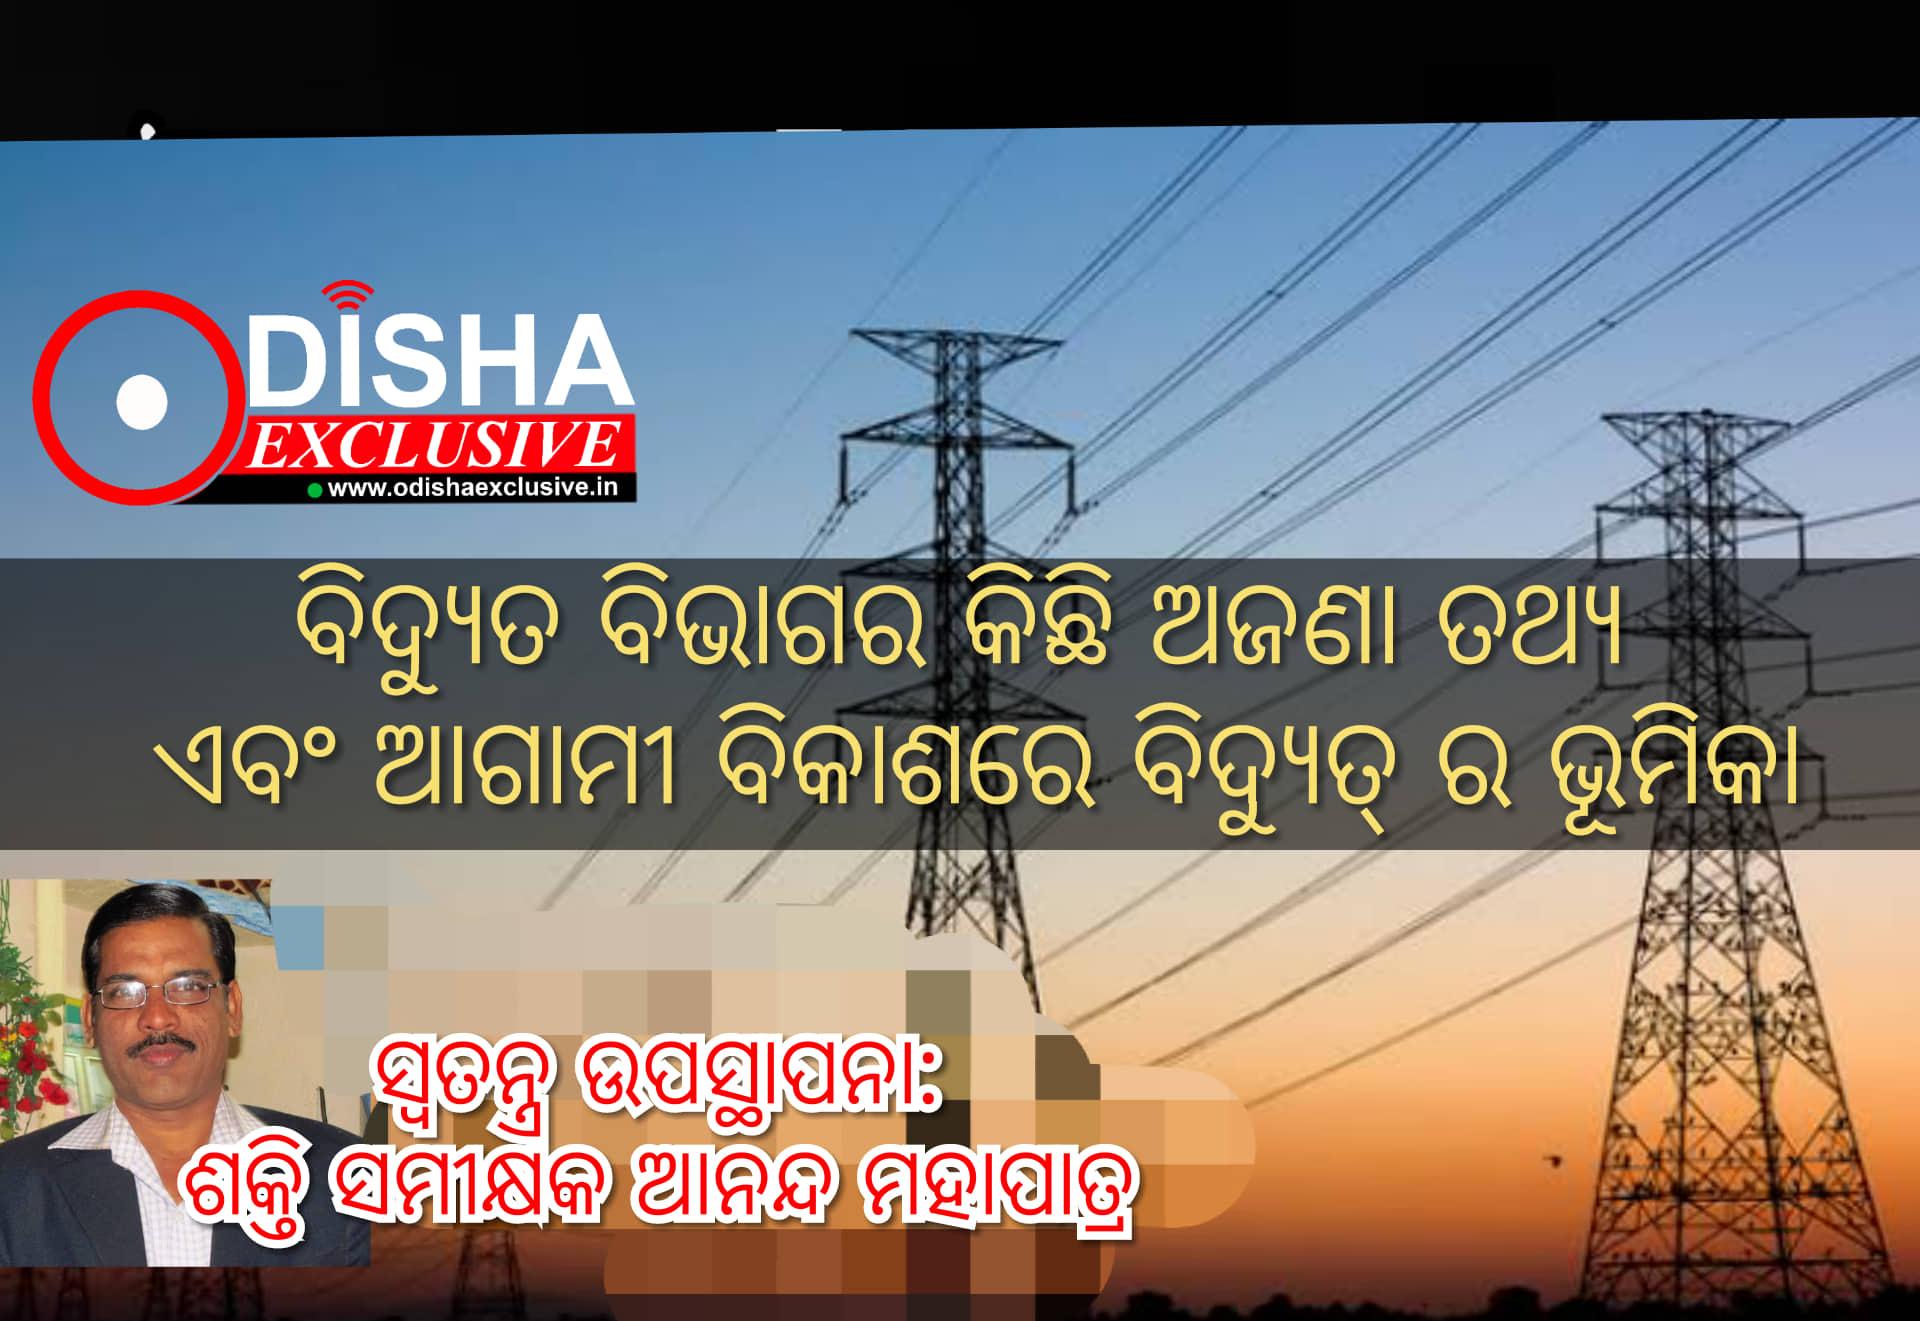 electricity service is the yardstik of development